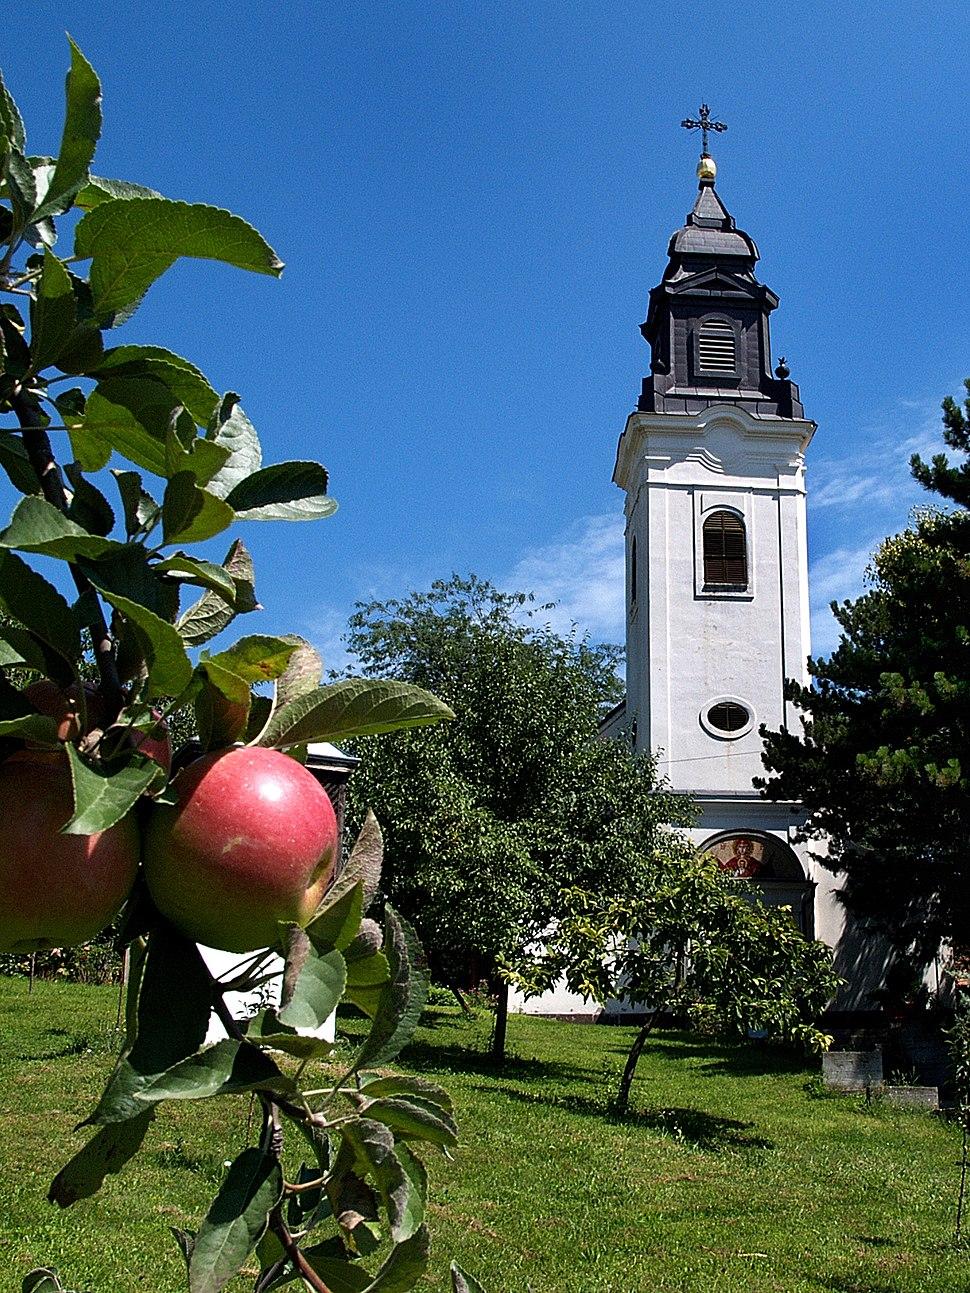 Pravoslavna-crkva-indjija